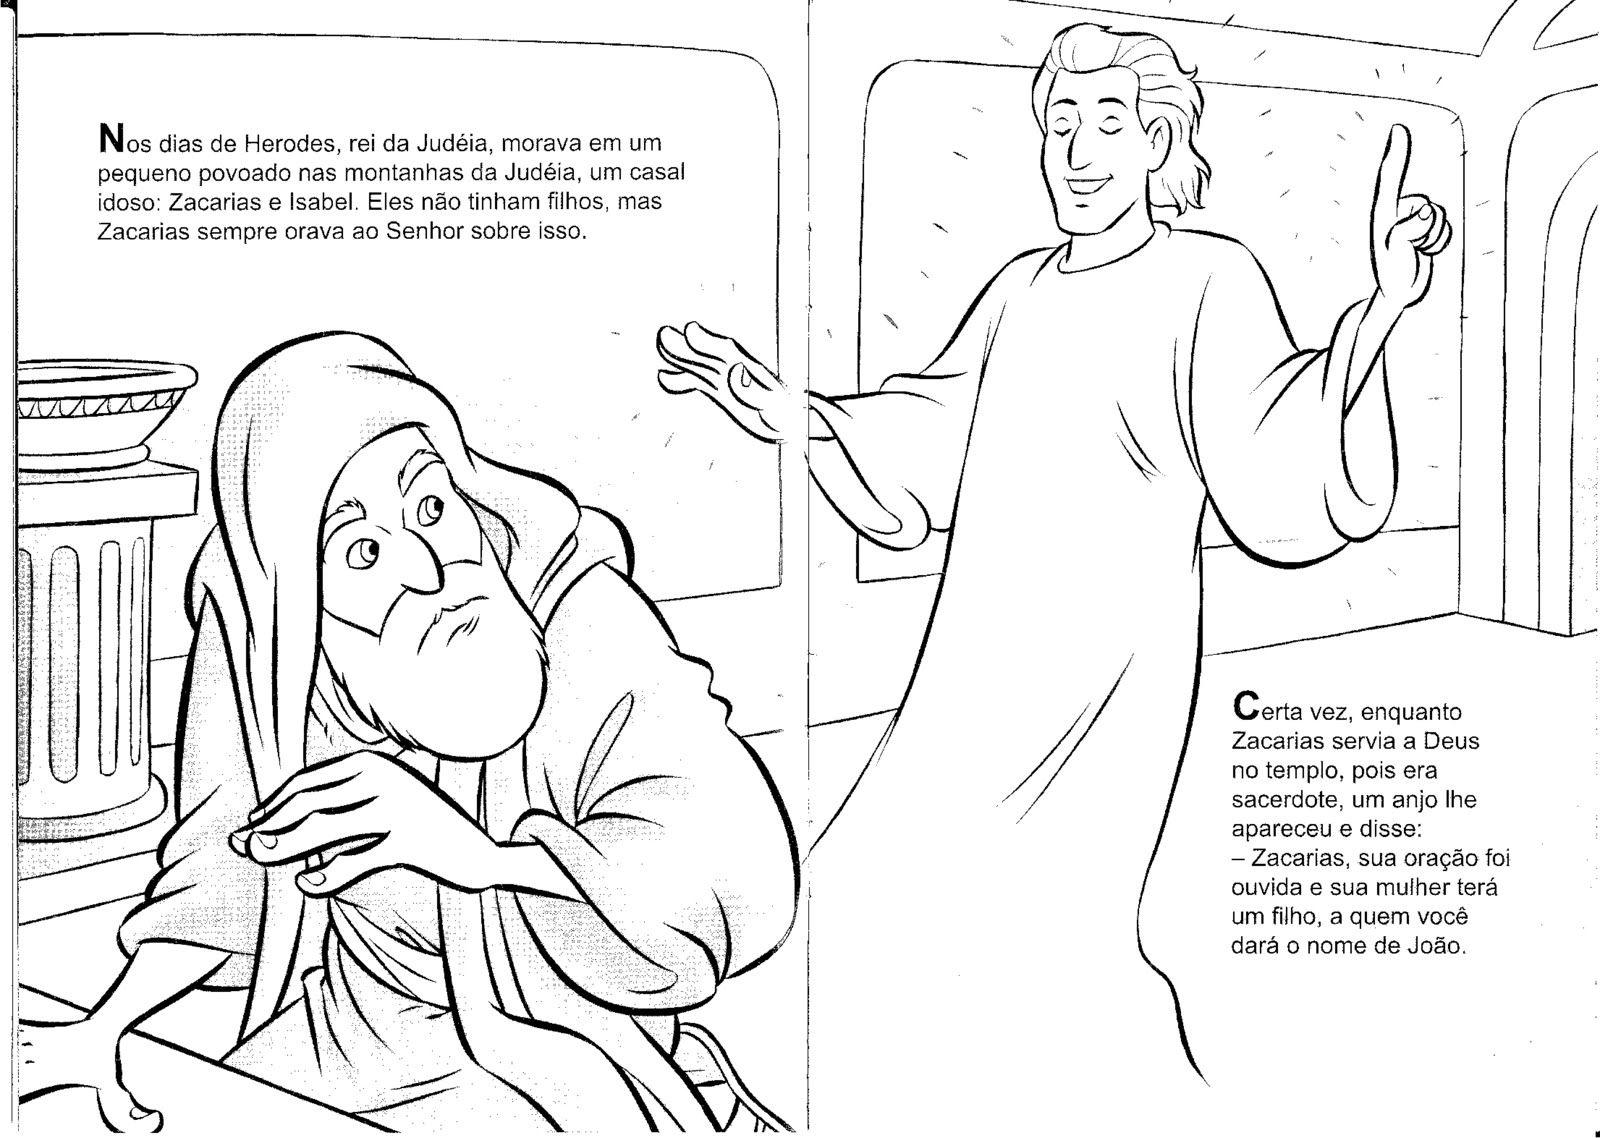 Pin De Joice Bruna Em Min Inf Ilustracoes Colorir Online Joao